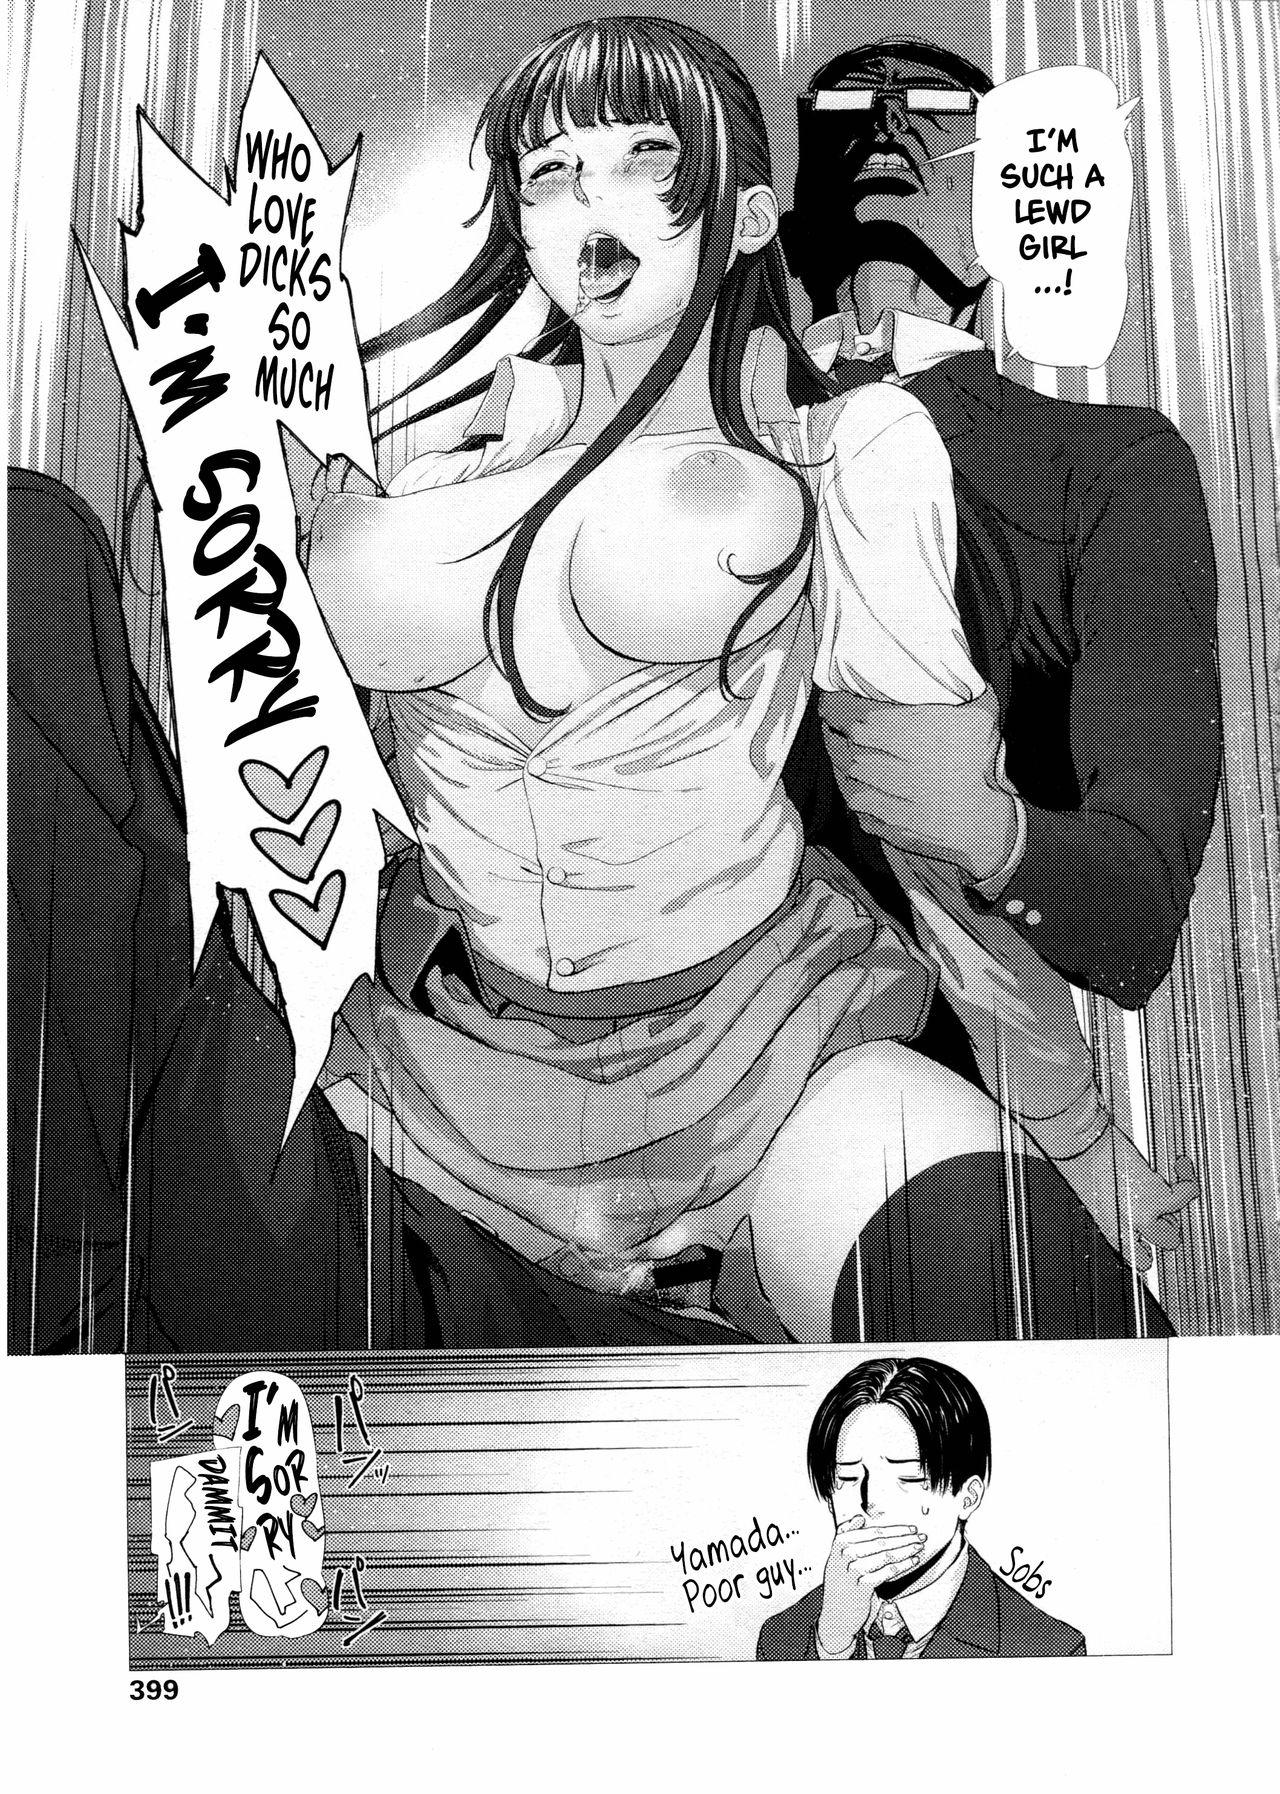 [Tsuriganesou] Gomen ne! Yamada-kun | Sorry! Yamada-kun (COMIC KOH Vol. 7) [English] [obsoletezero] 18